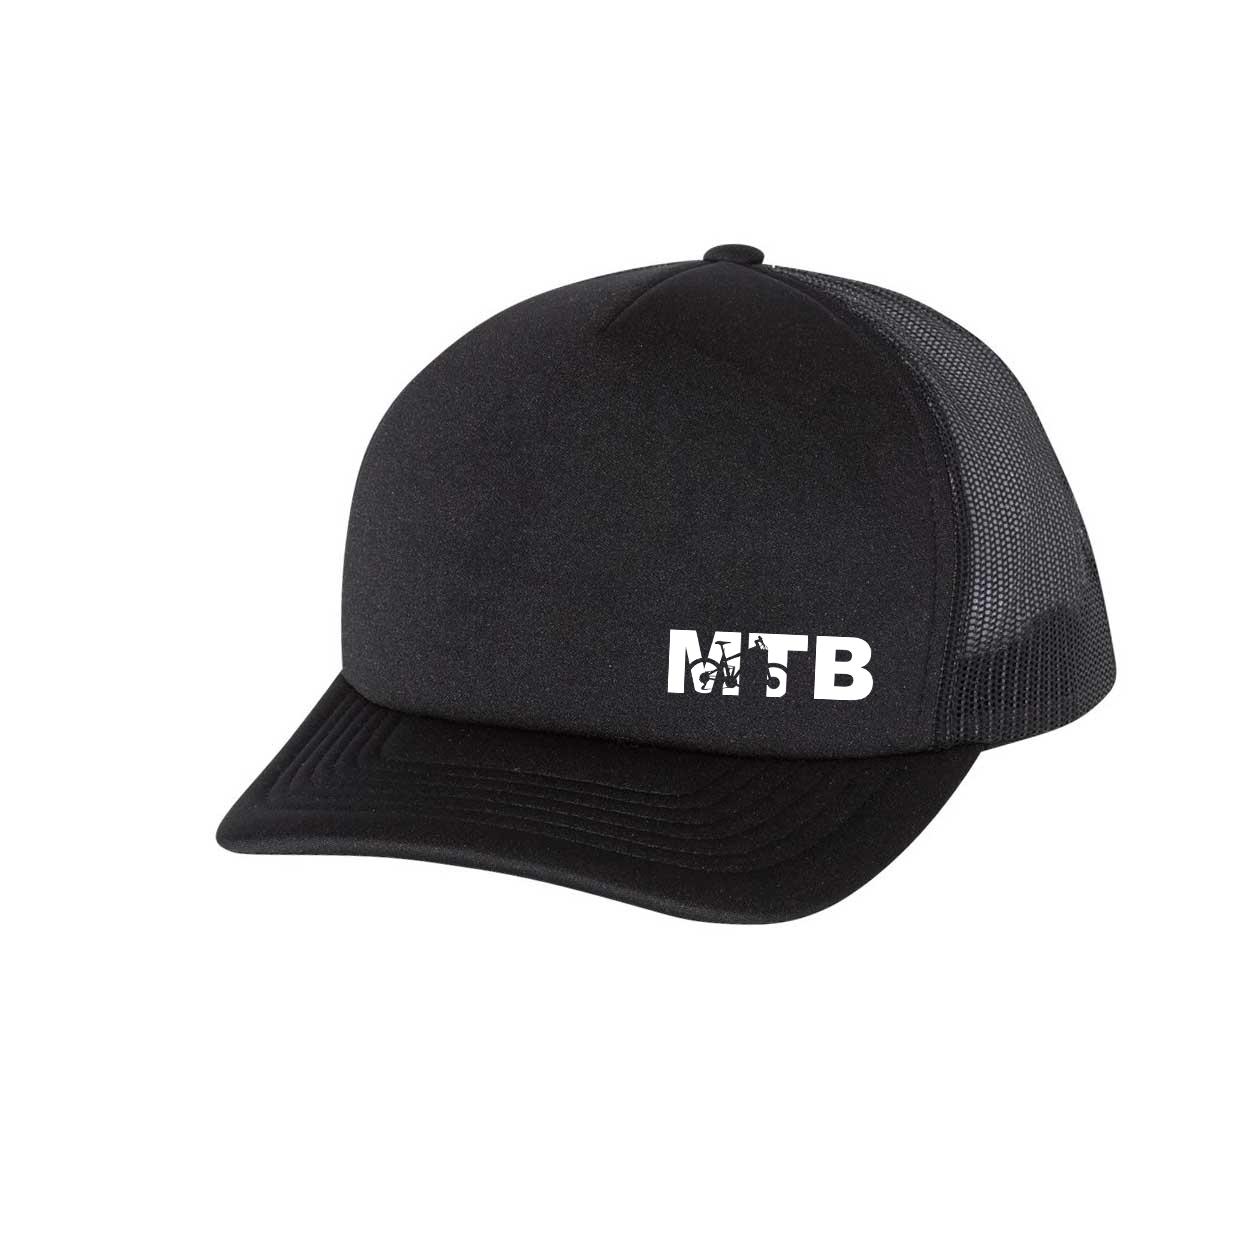 MTB Mountain Bike Logo Night Out Premium Foam Trucker Snapback Hat Black (White Logo)